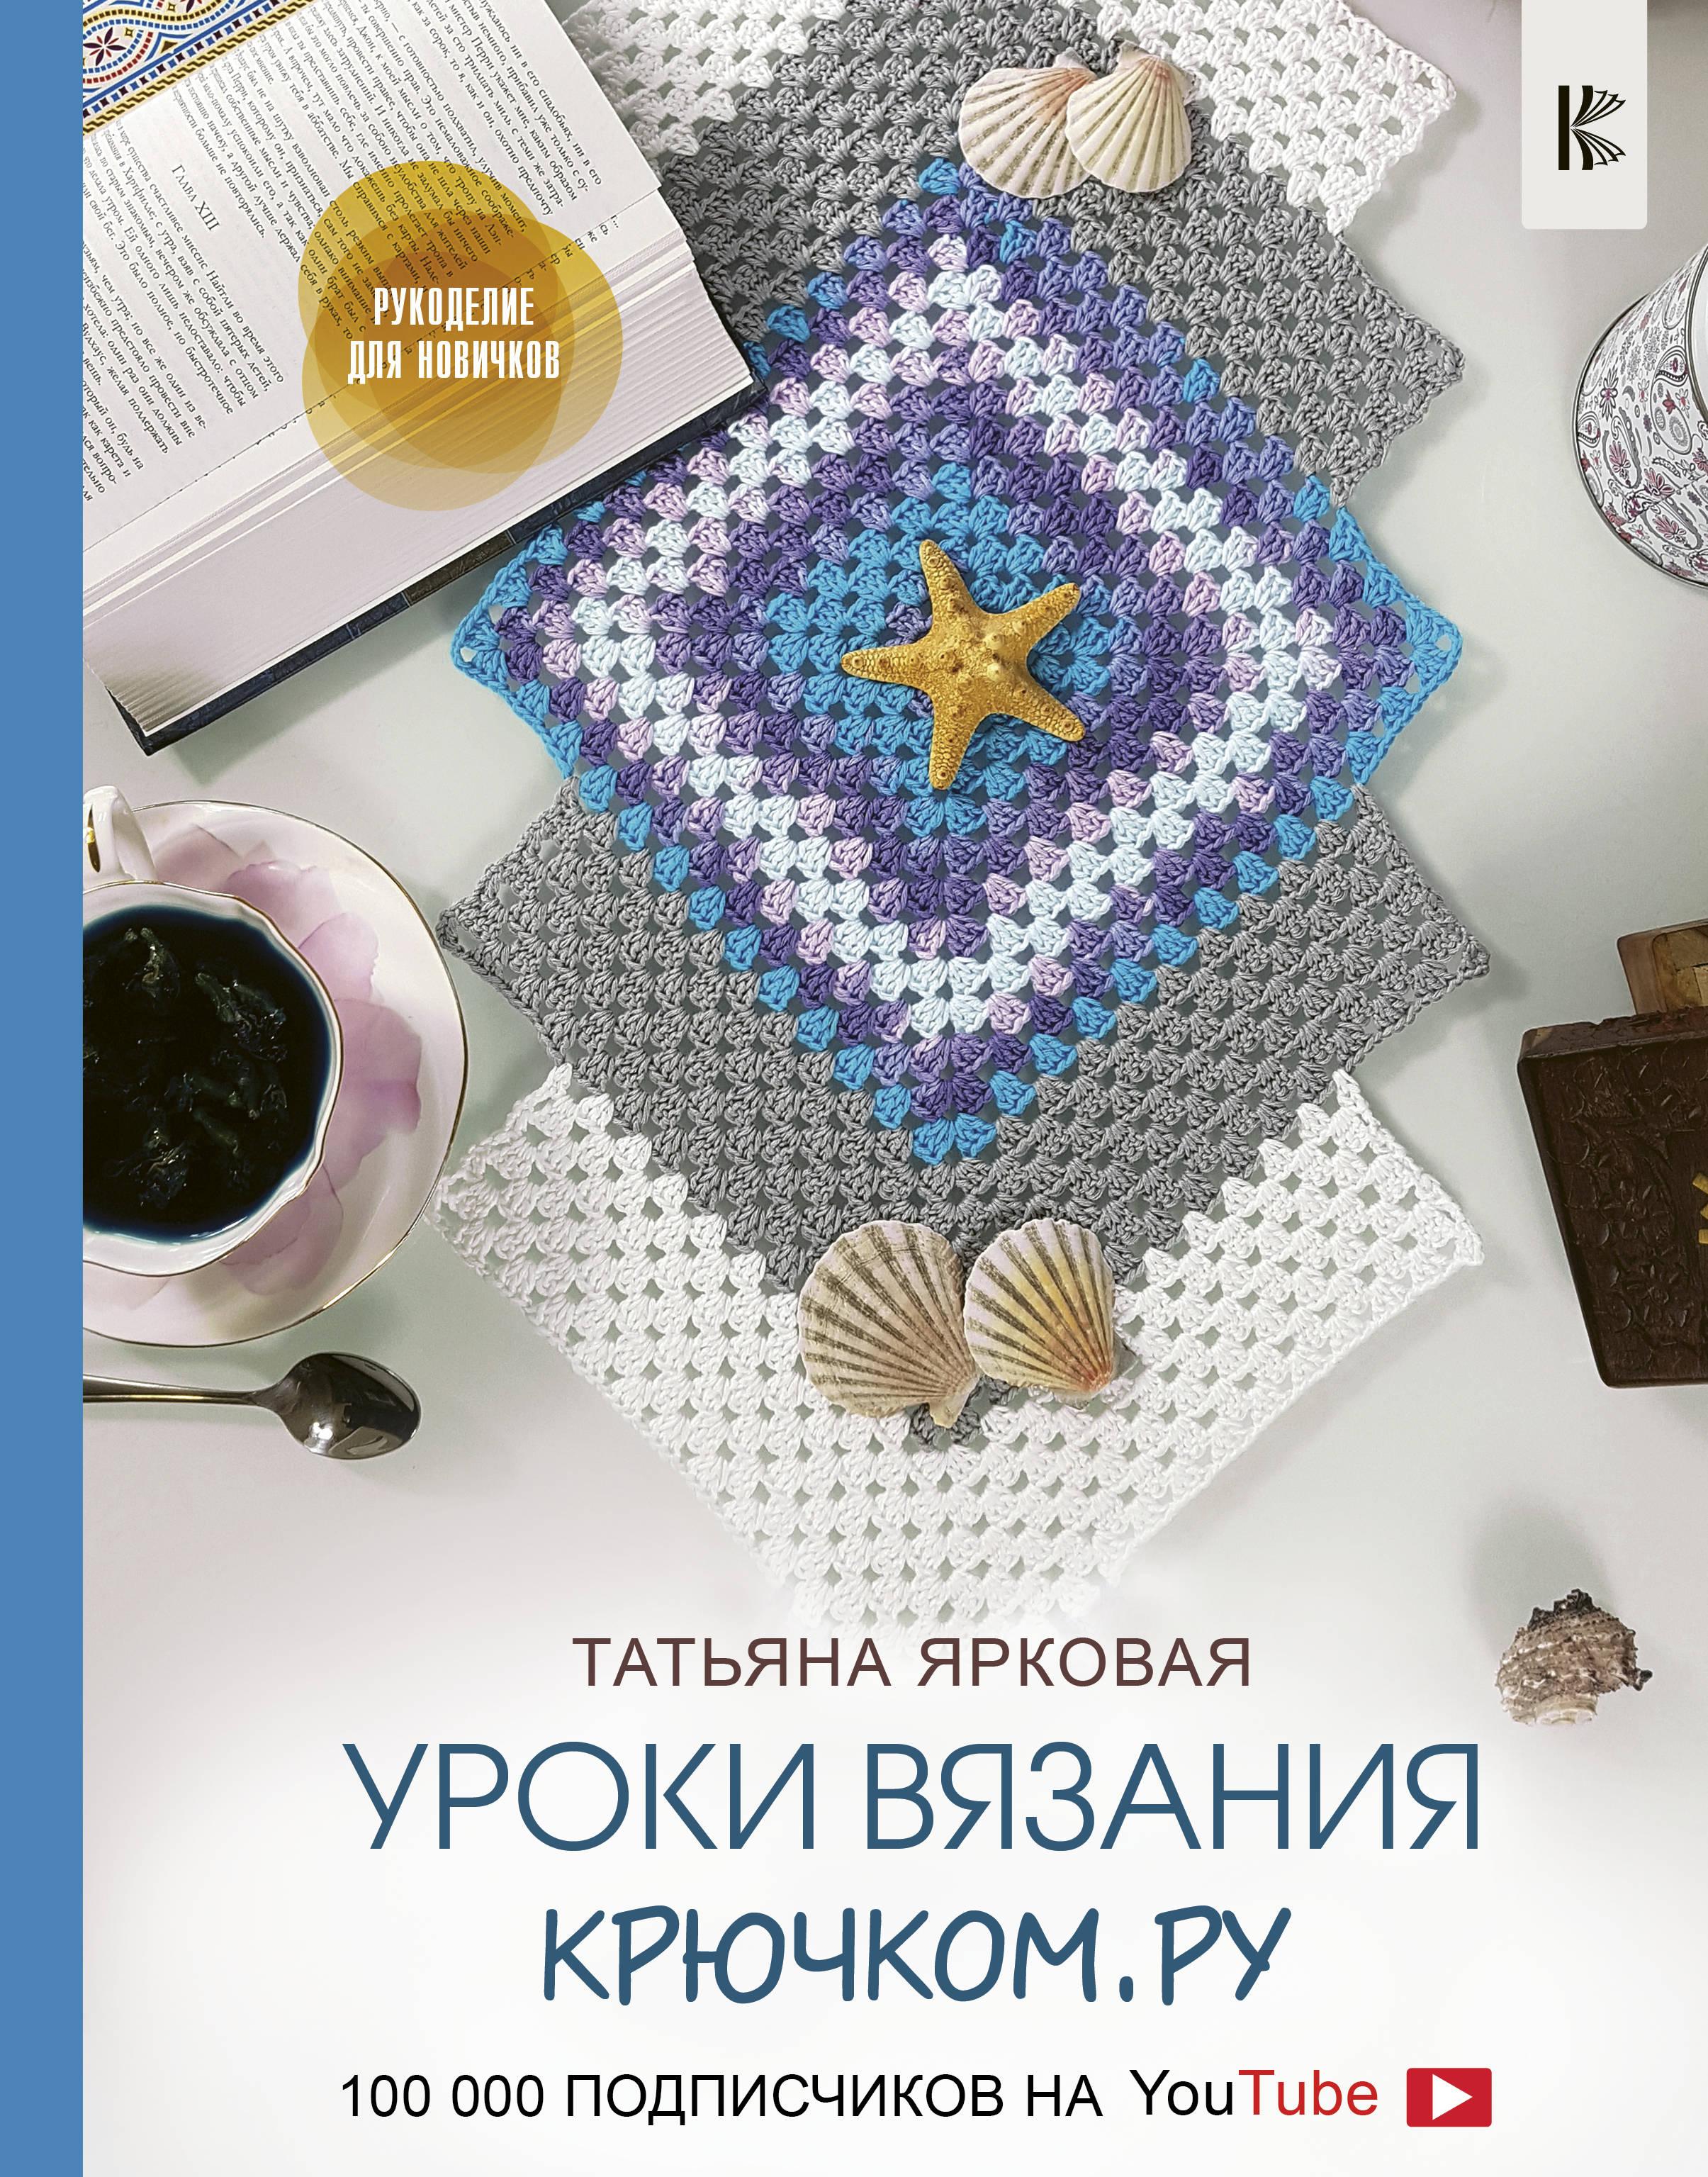 Татьяна Ярковая Уроки вязания Крючком.ру